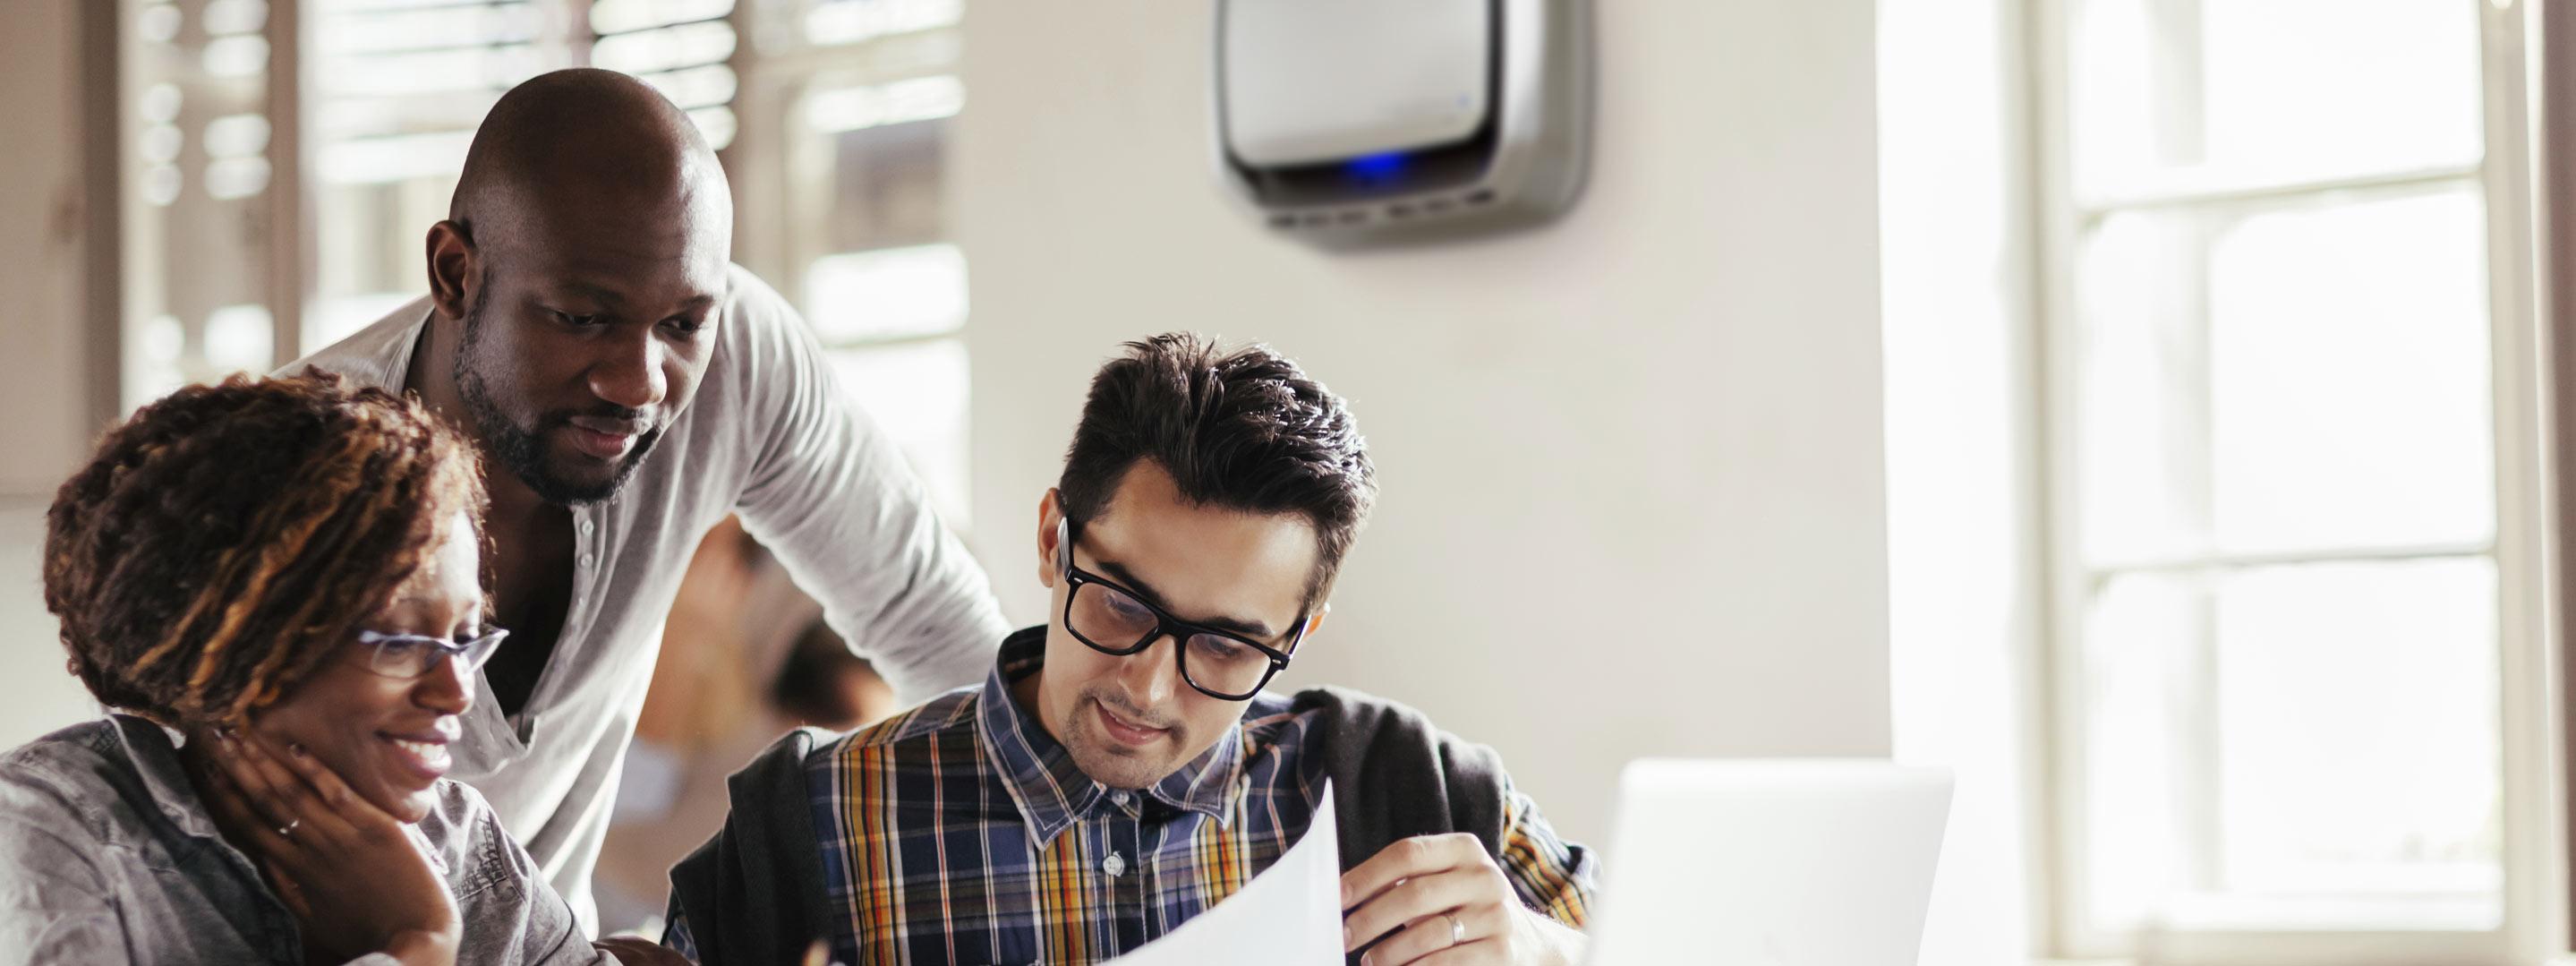 Rena luften på ditt kontor med AeraMax Professional professionella luftrengörare.